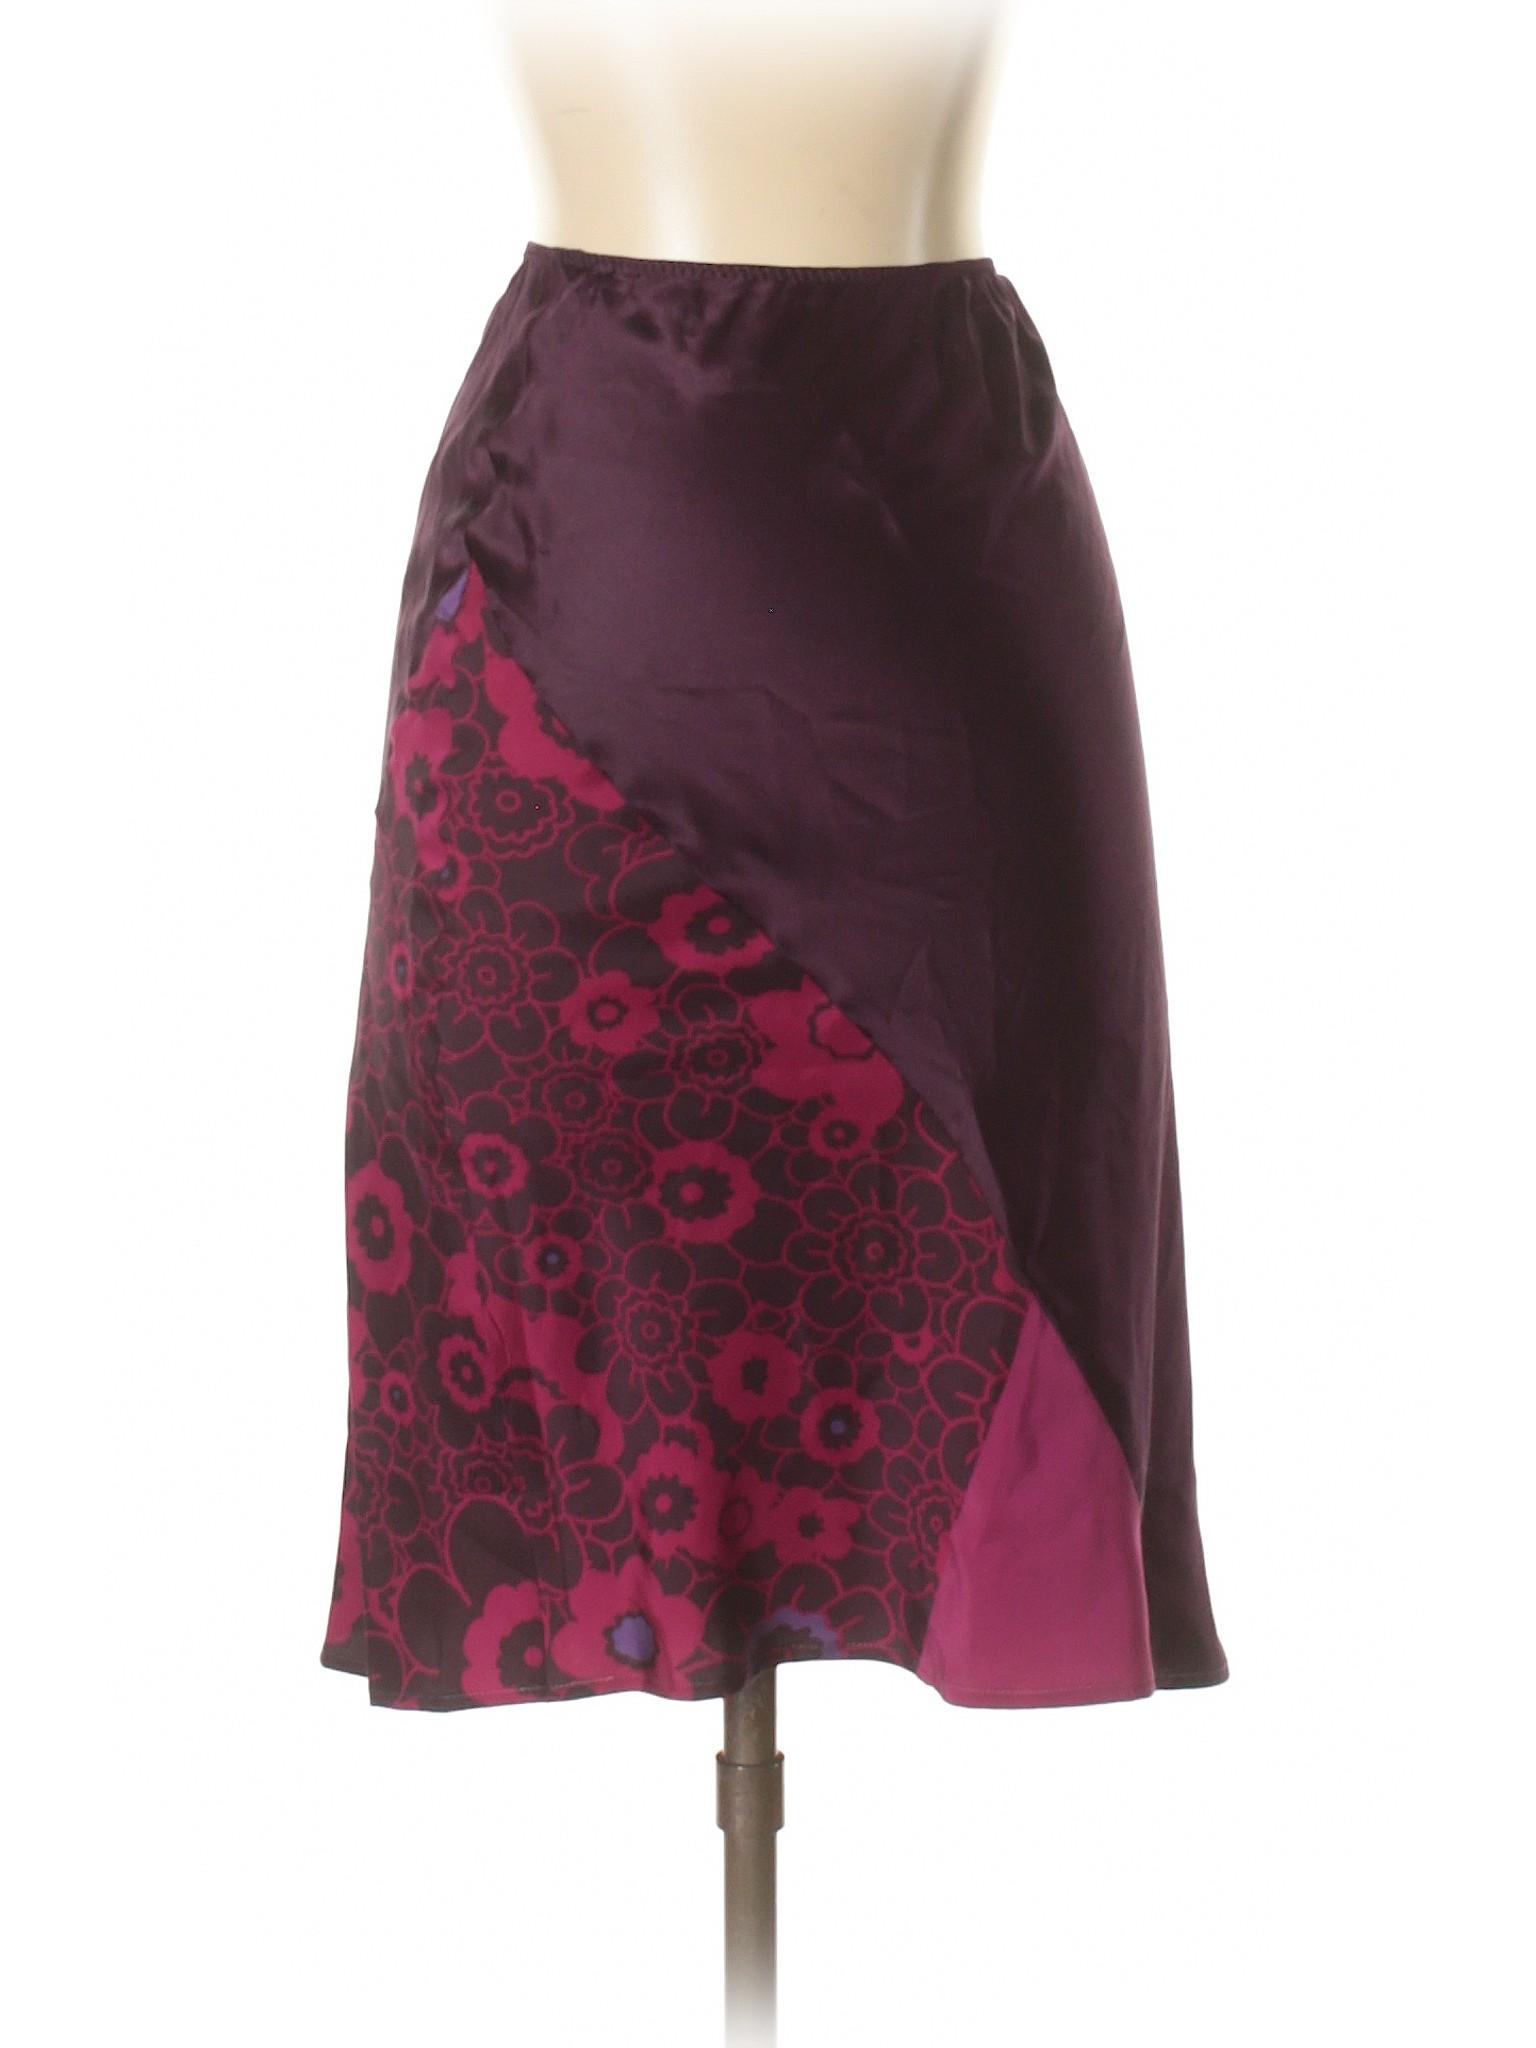 Silk Boutique Skirt Boutique Boutique Boutique Skirt Silk Silk Skirt Silk RFHxqw8